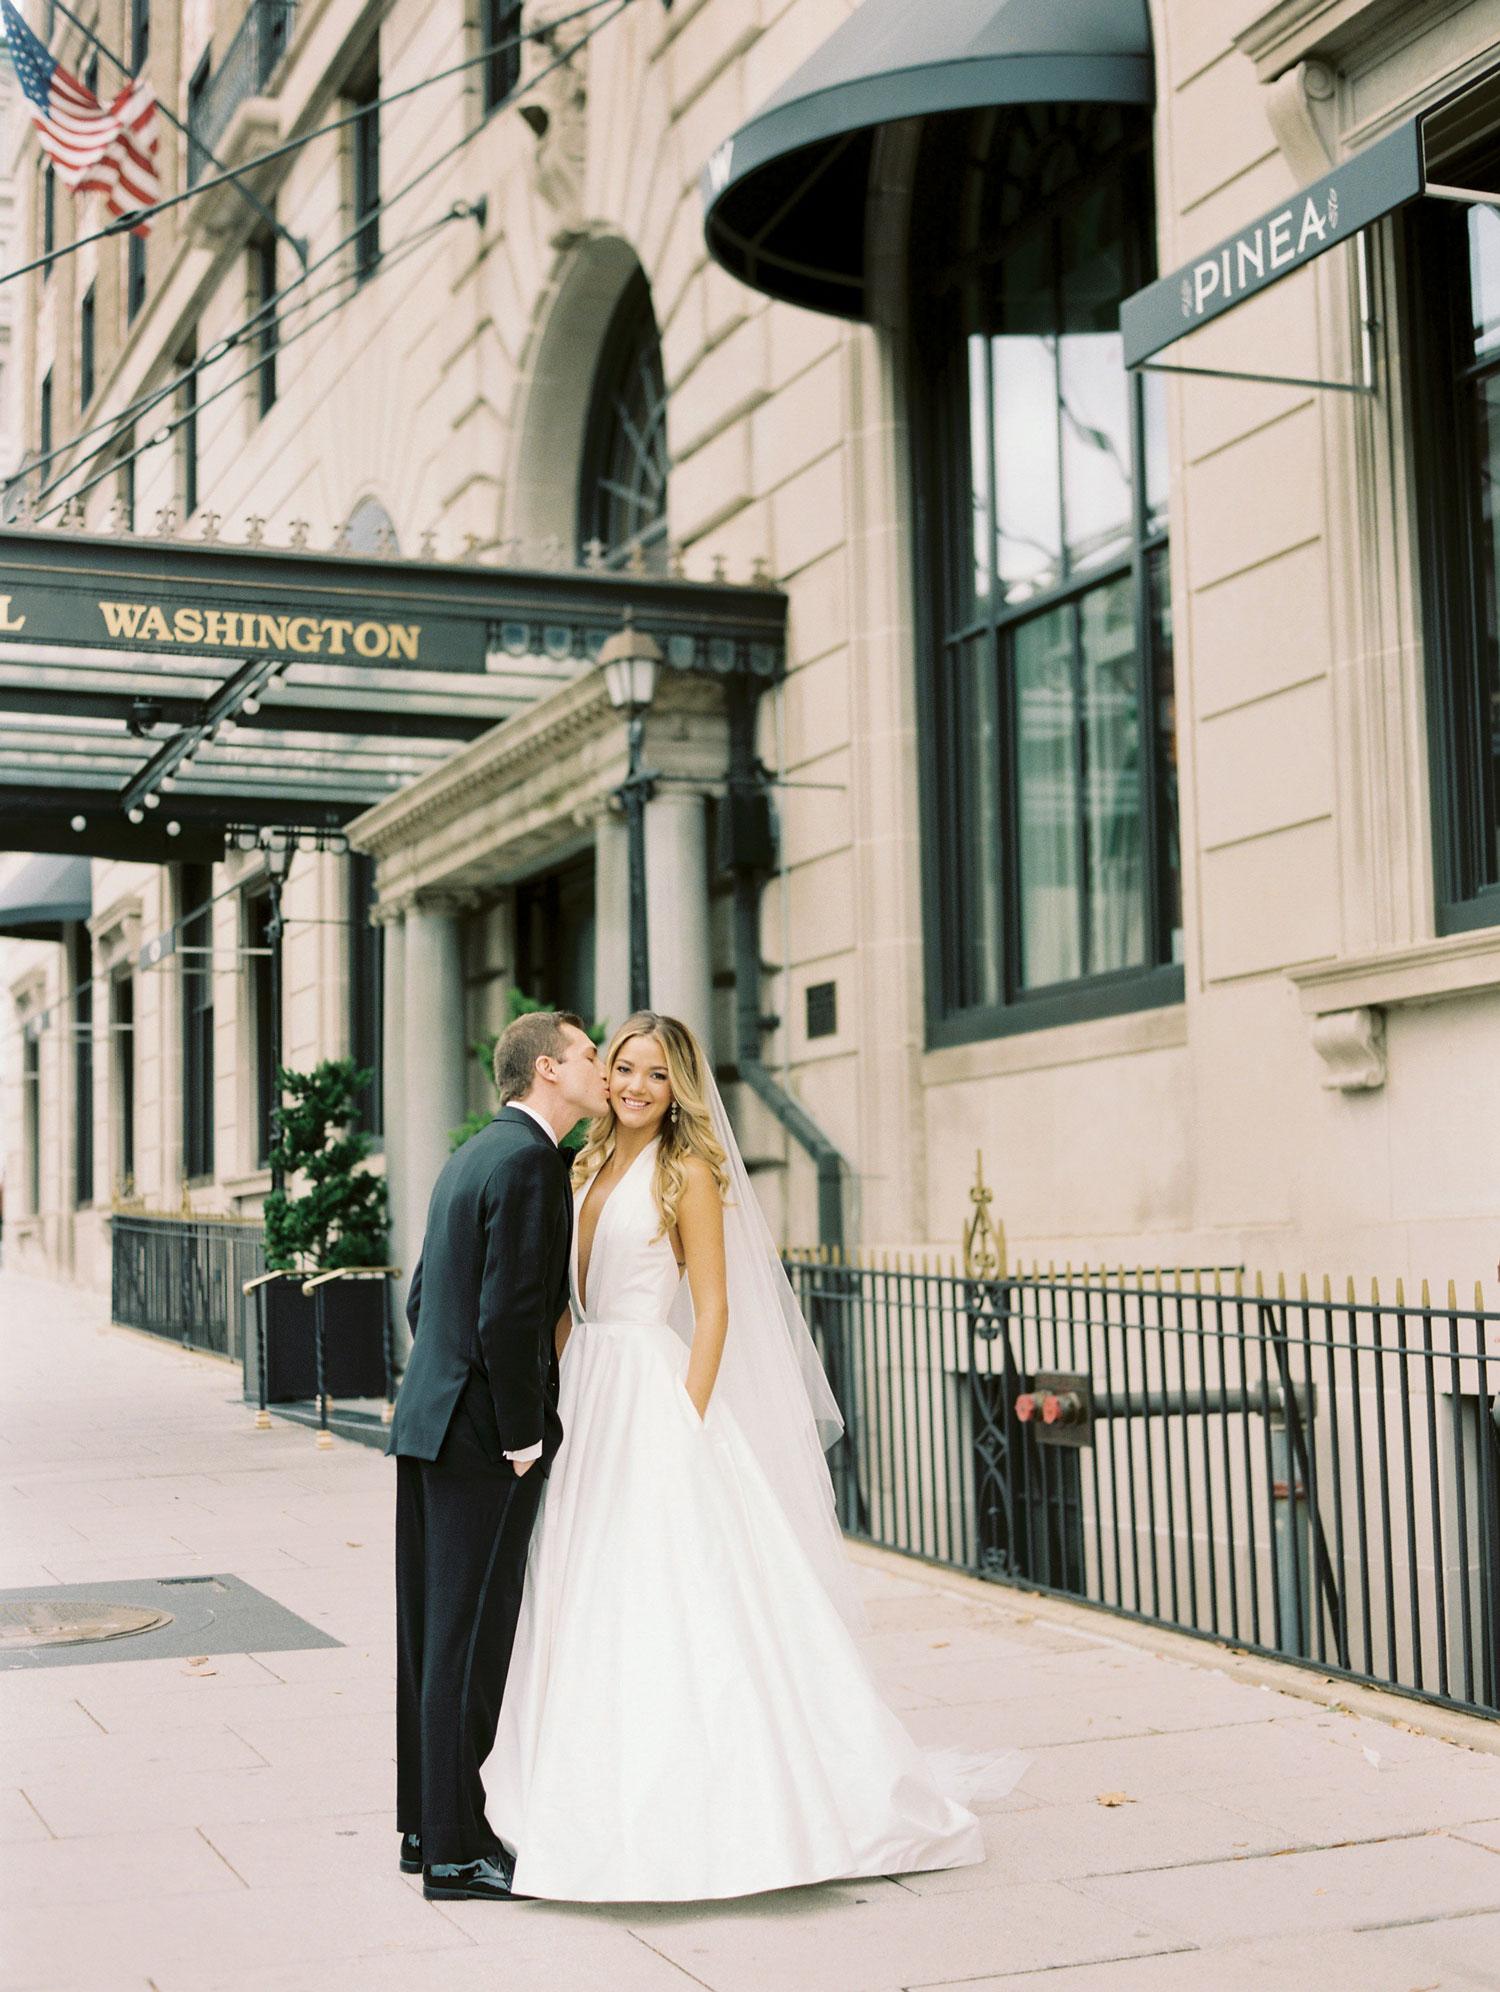 Bride in deep v neck wedding dress romona keveza from carine's bridal atelier Inside Weddings fall 2018 issue